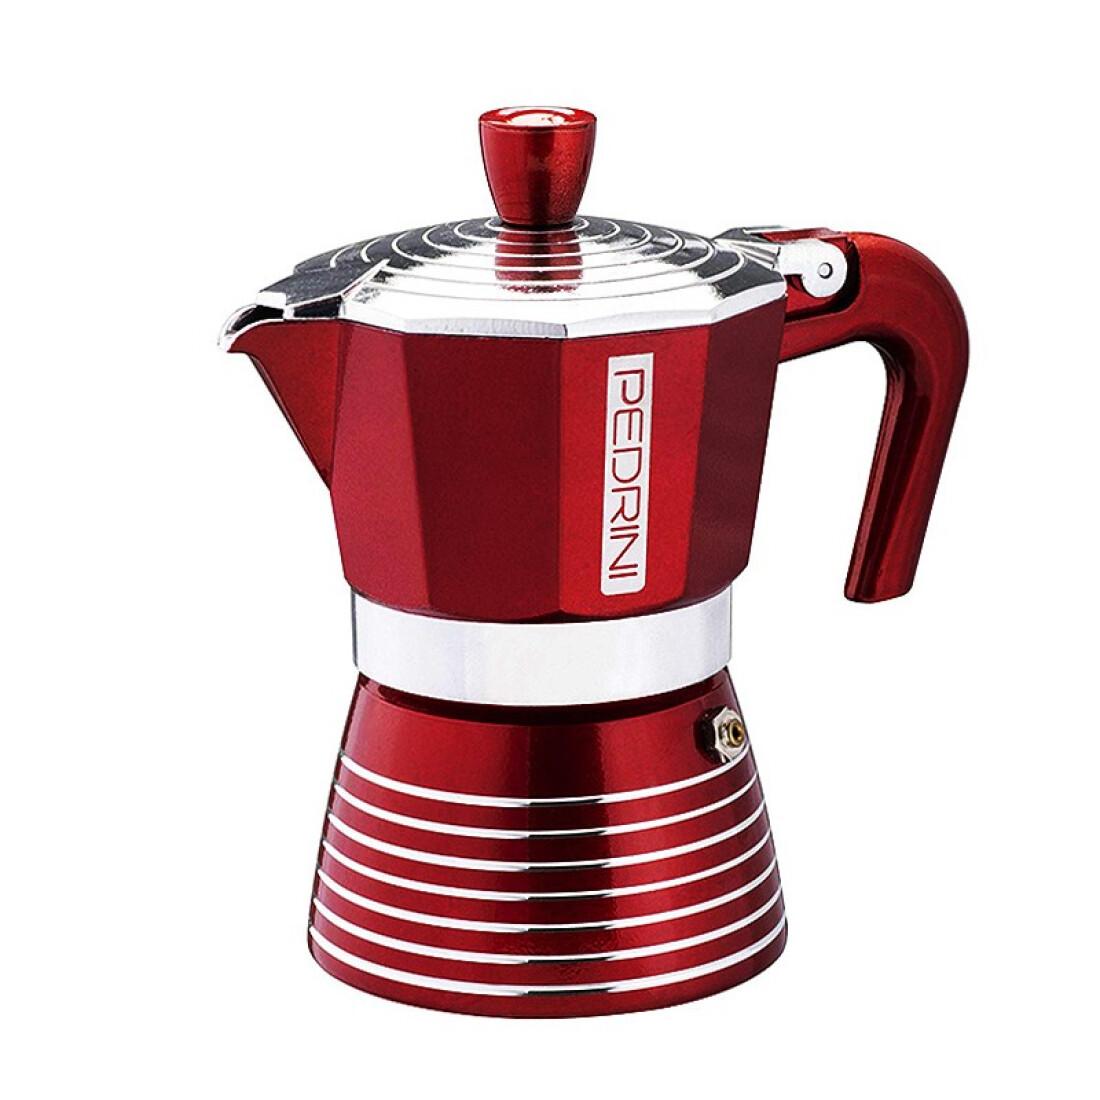 Pedrini Infinity Moka Pot 6 Cup